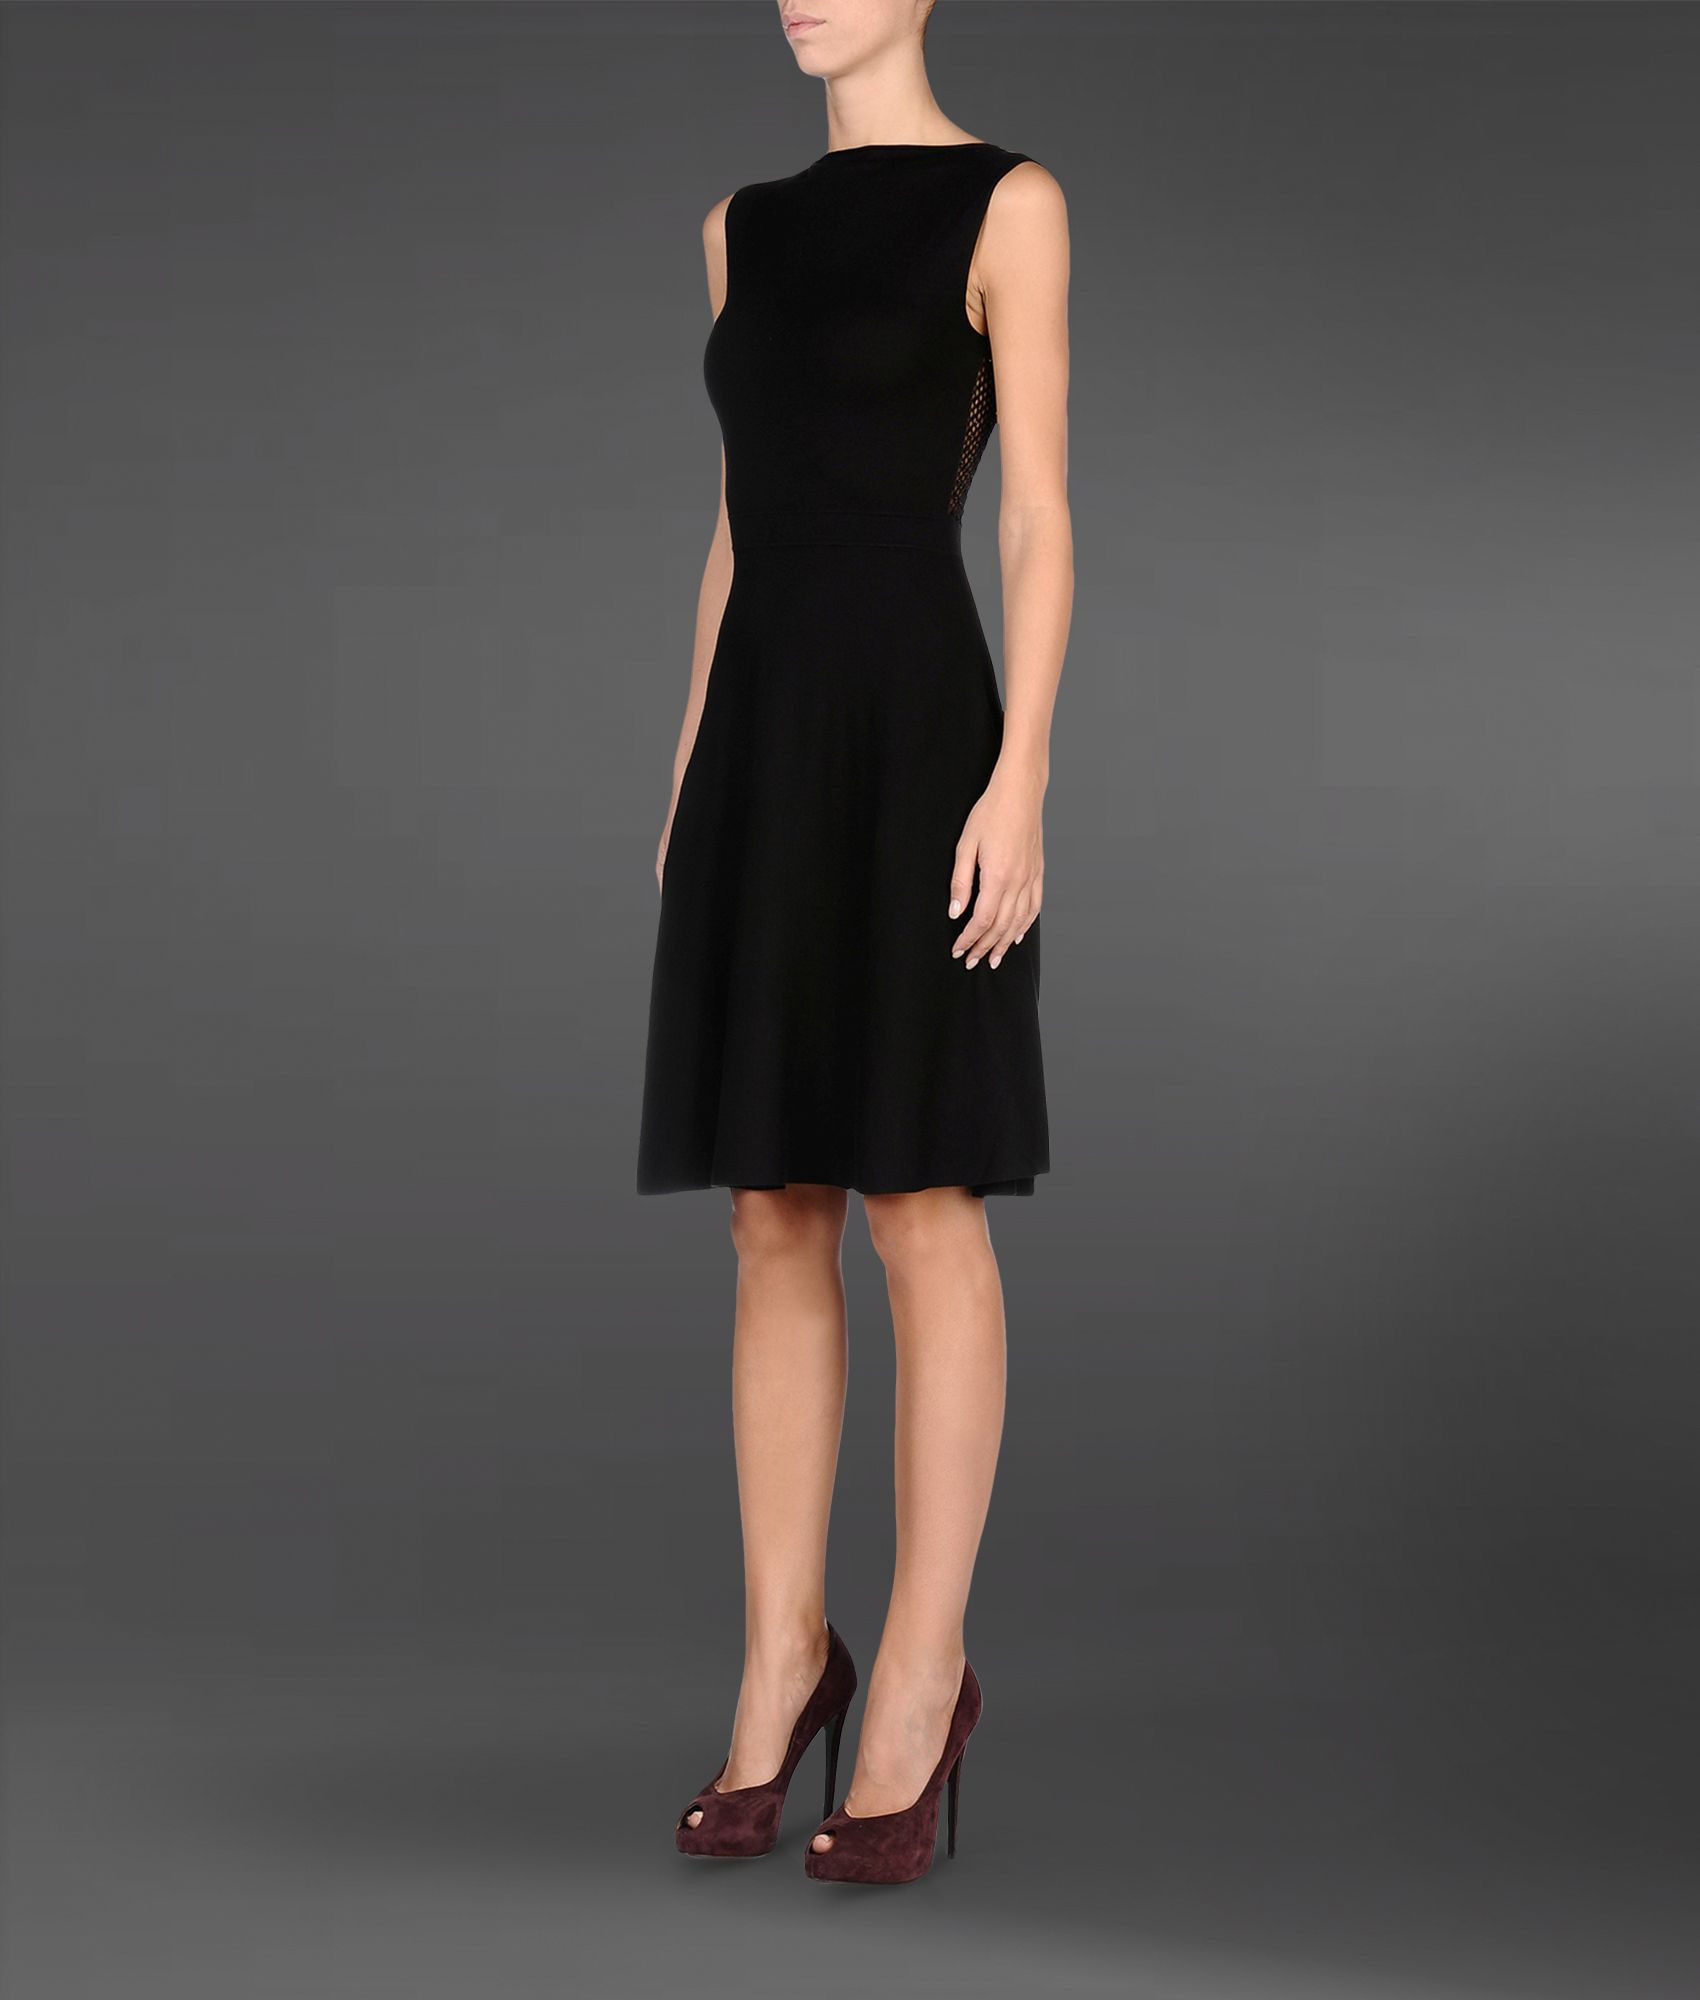 Lyst - Emporio Armani Short Dress in Black